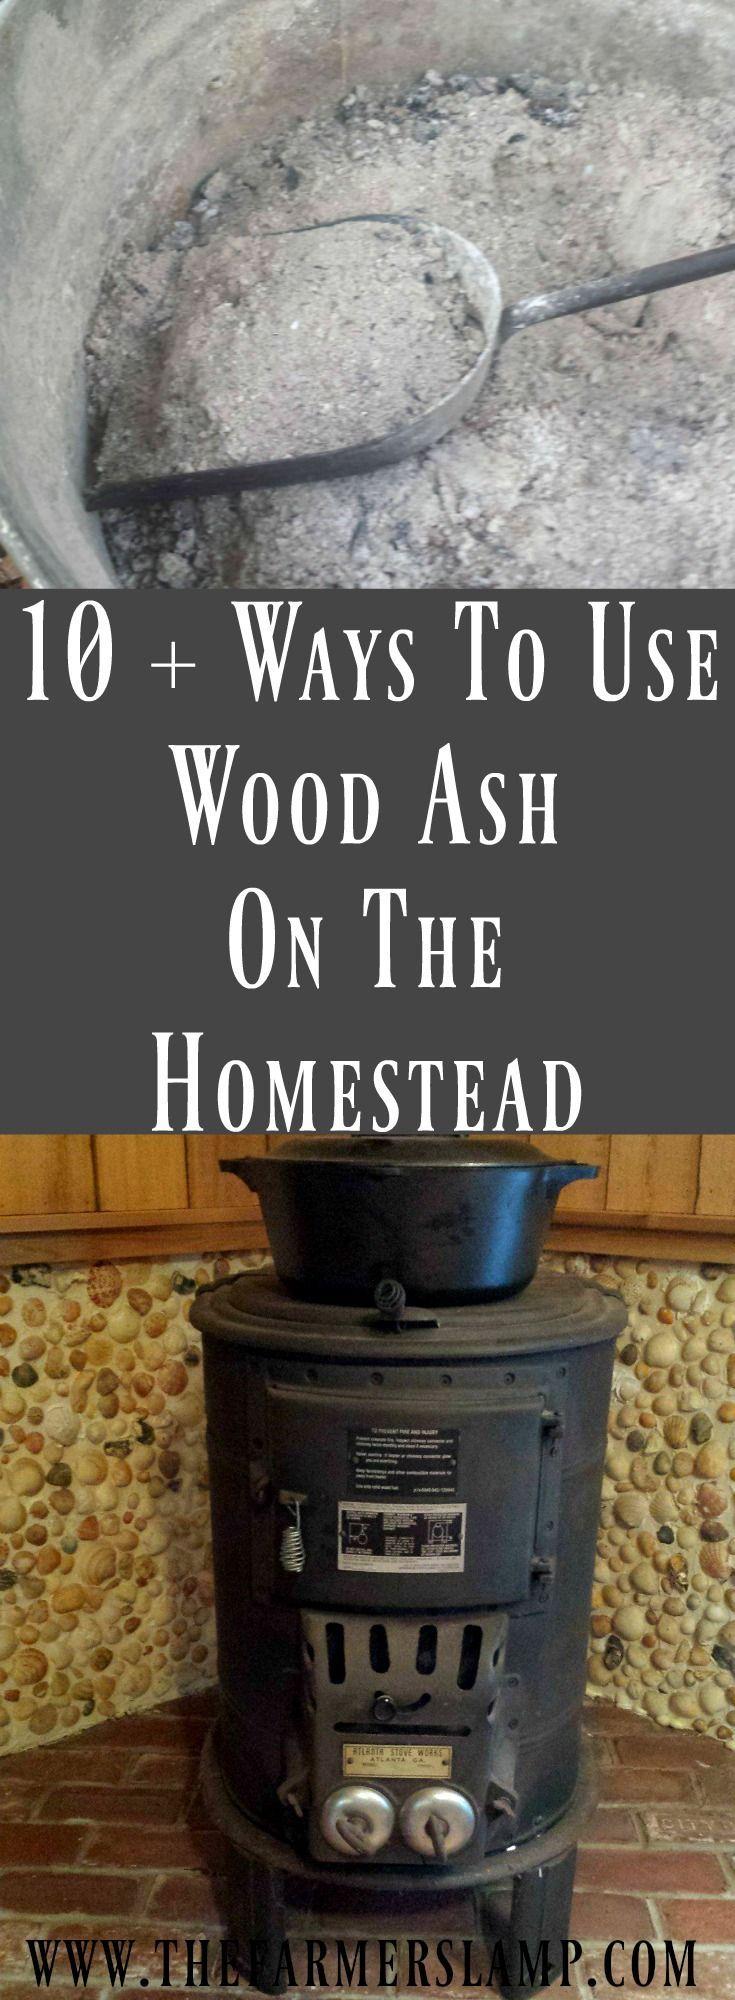 10 ways to use wood ash on the homestead gardening fun pinterest jardinage jardins et. Black Bedroom Furniture Sets. Home Design Ideas